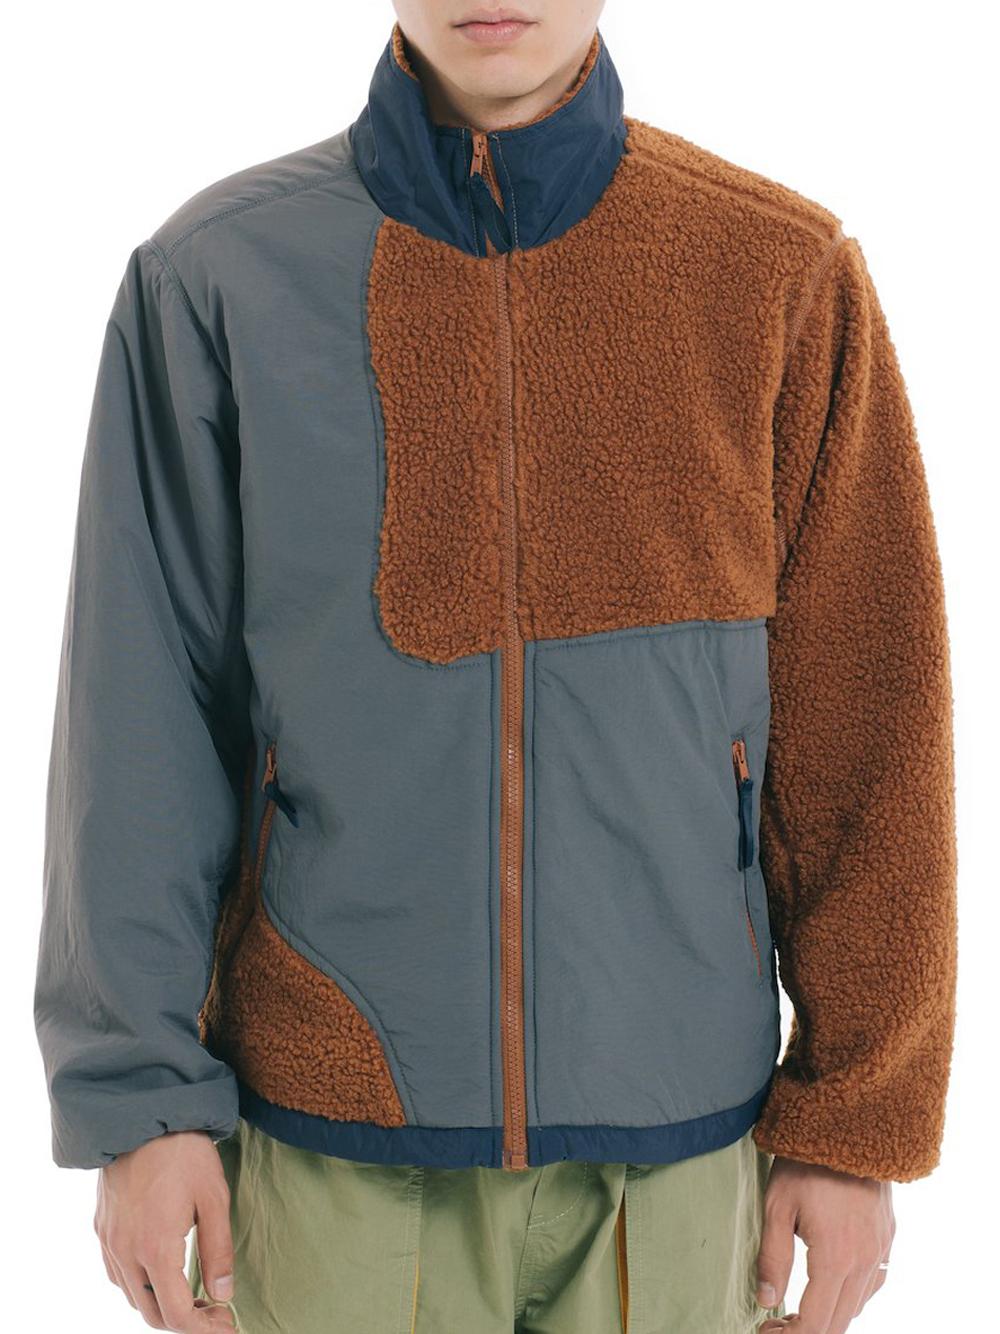 sherpa jackert man brown and gray  BRAIN DEAD | Jackets | F21O09001878BROWN